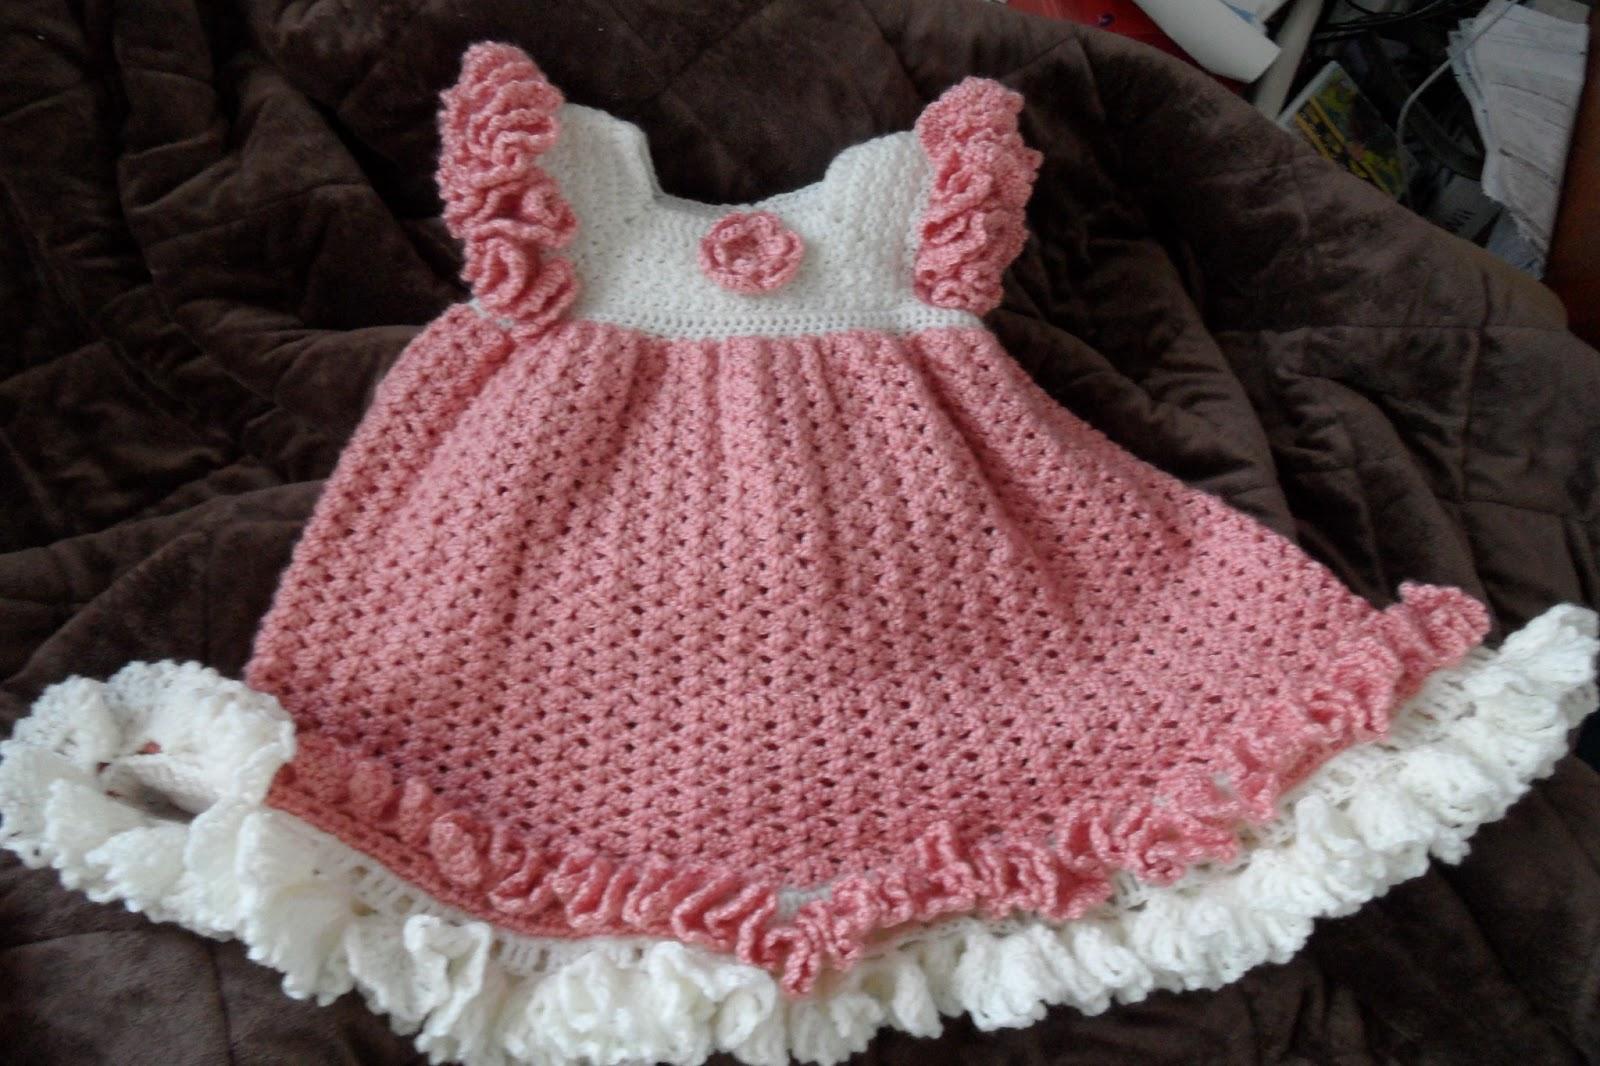 Vestidos en crochet para bebé paso a paso - Imagui